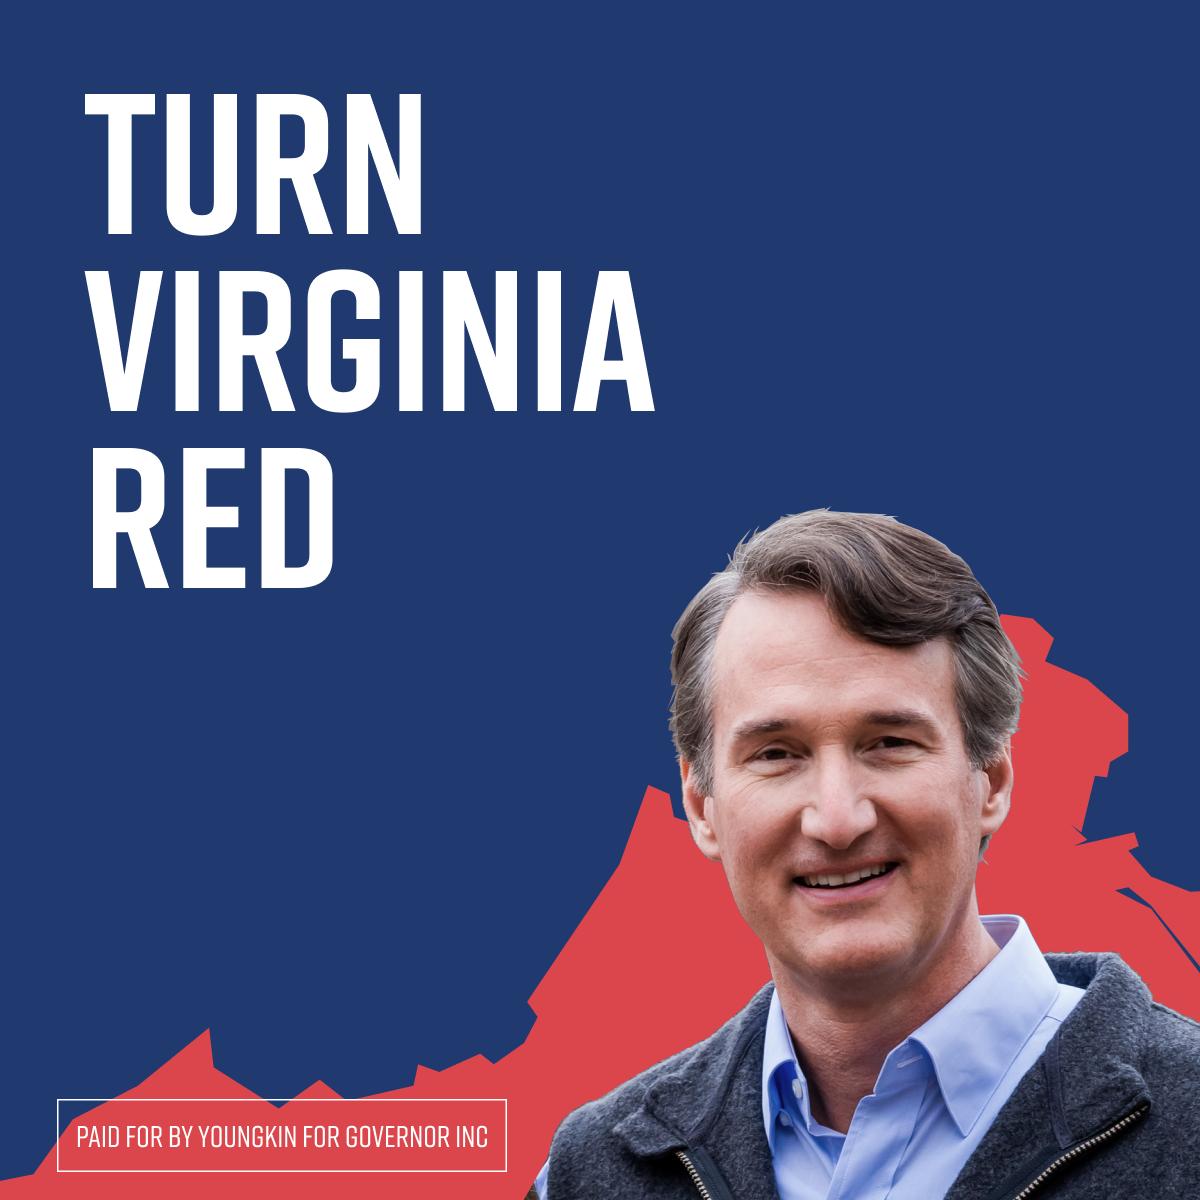 Youngkin Turn Virginia Red Social Post